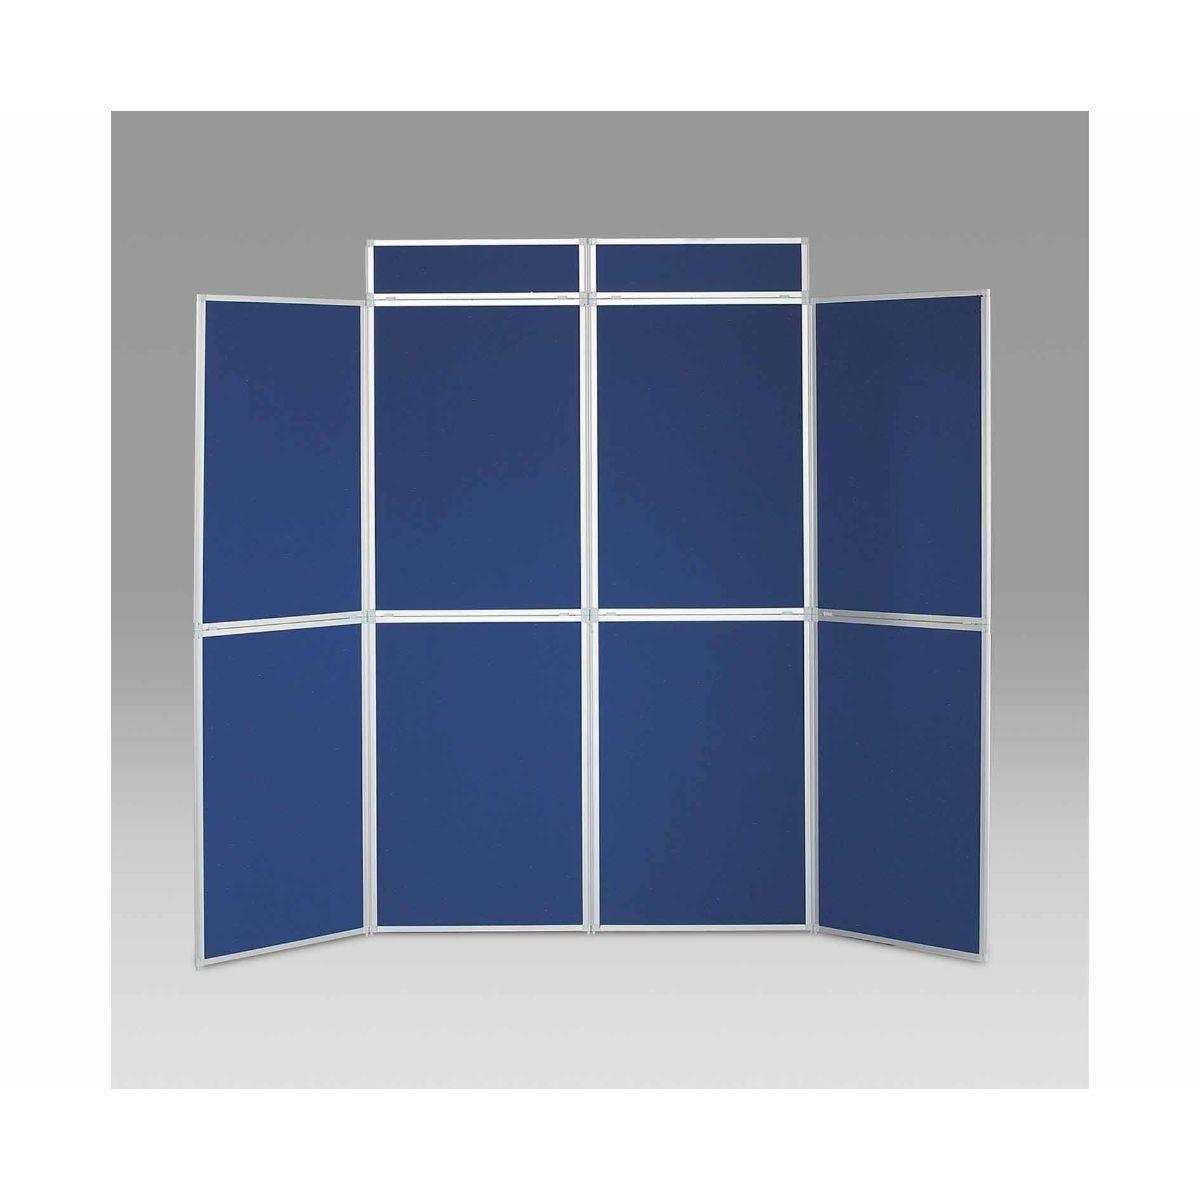 Metroplan BusyFold Aluminium Framed Folding Display 8 Panels